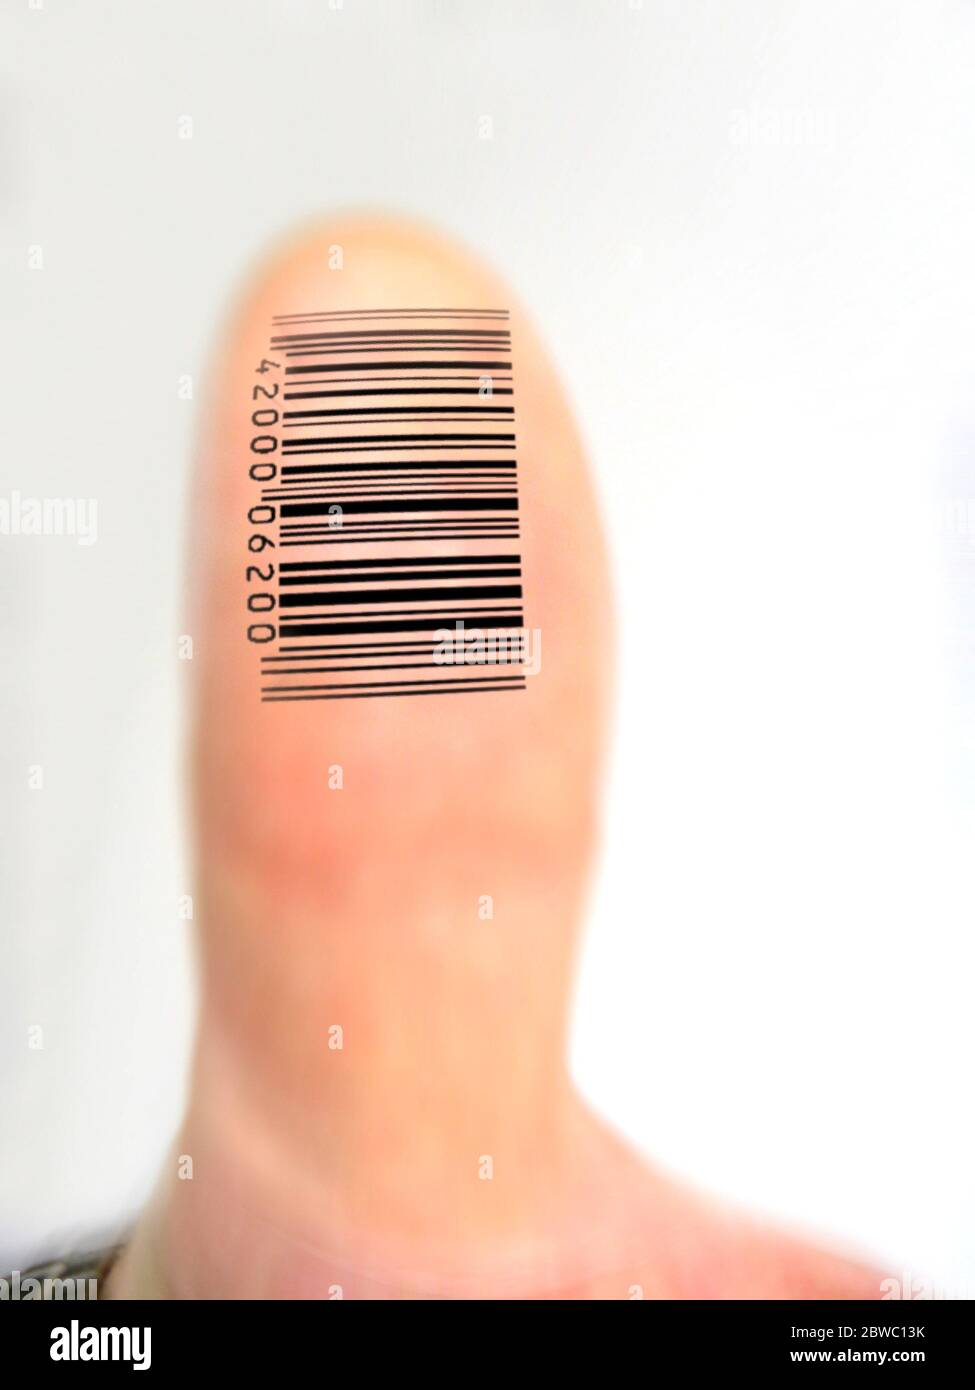 Digitaler Fingerabdruck, Daumen, Stock Photo